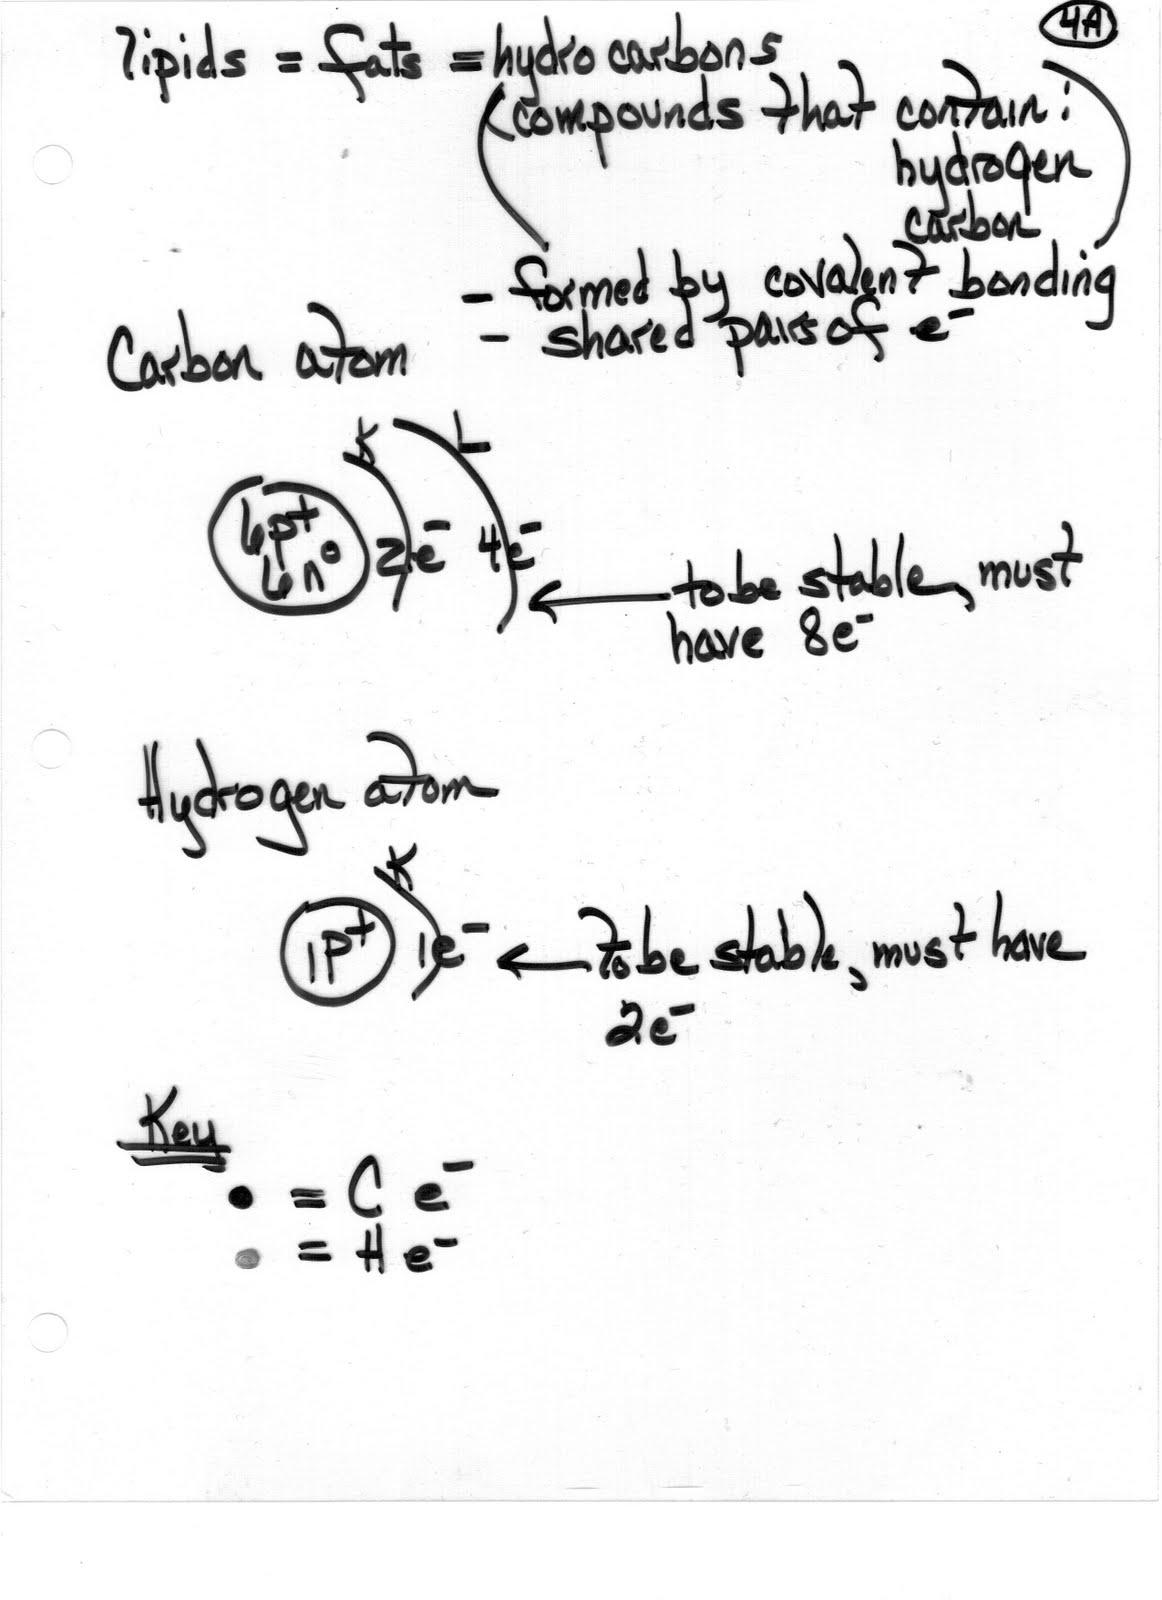 Ms. Friedman's Biology Class: Biochemistry Notes